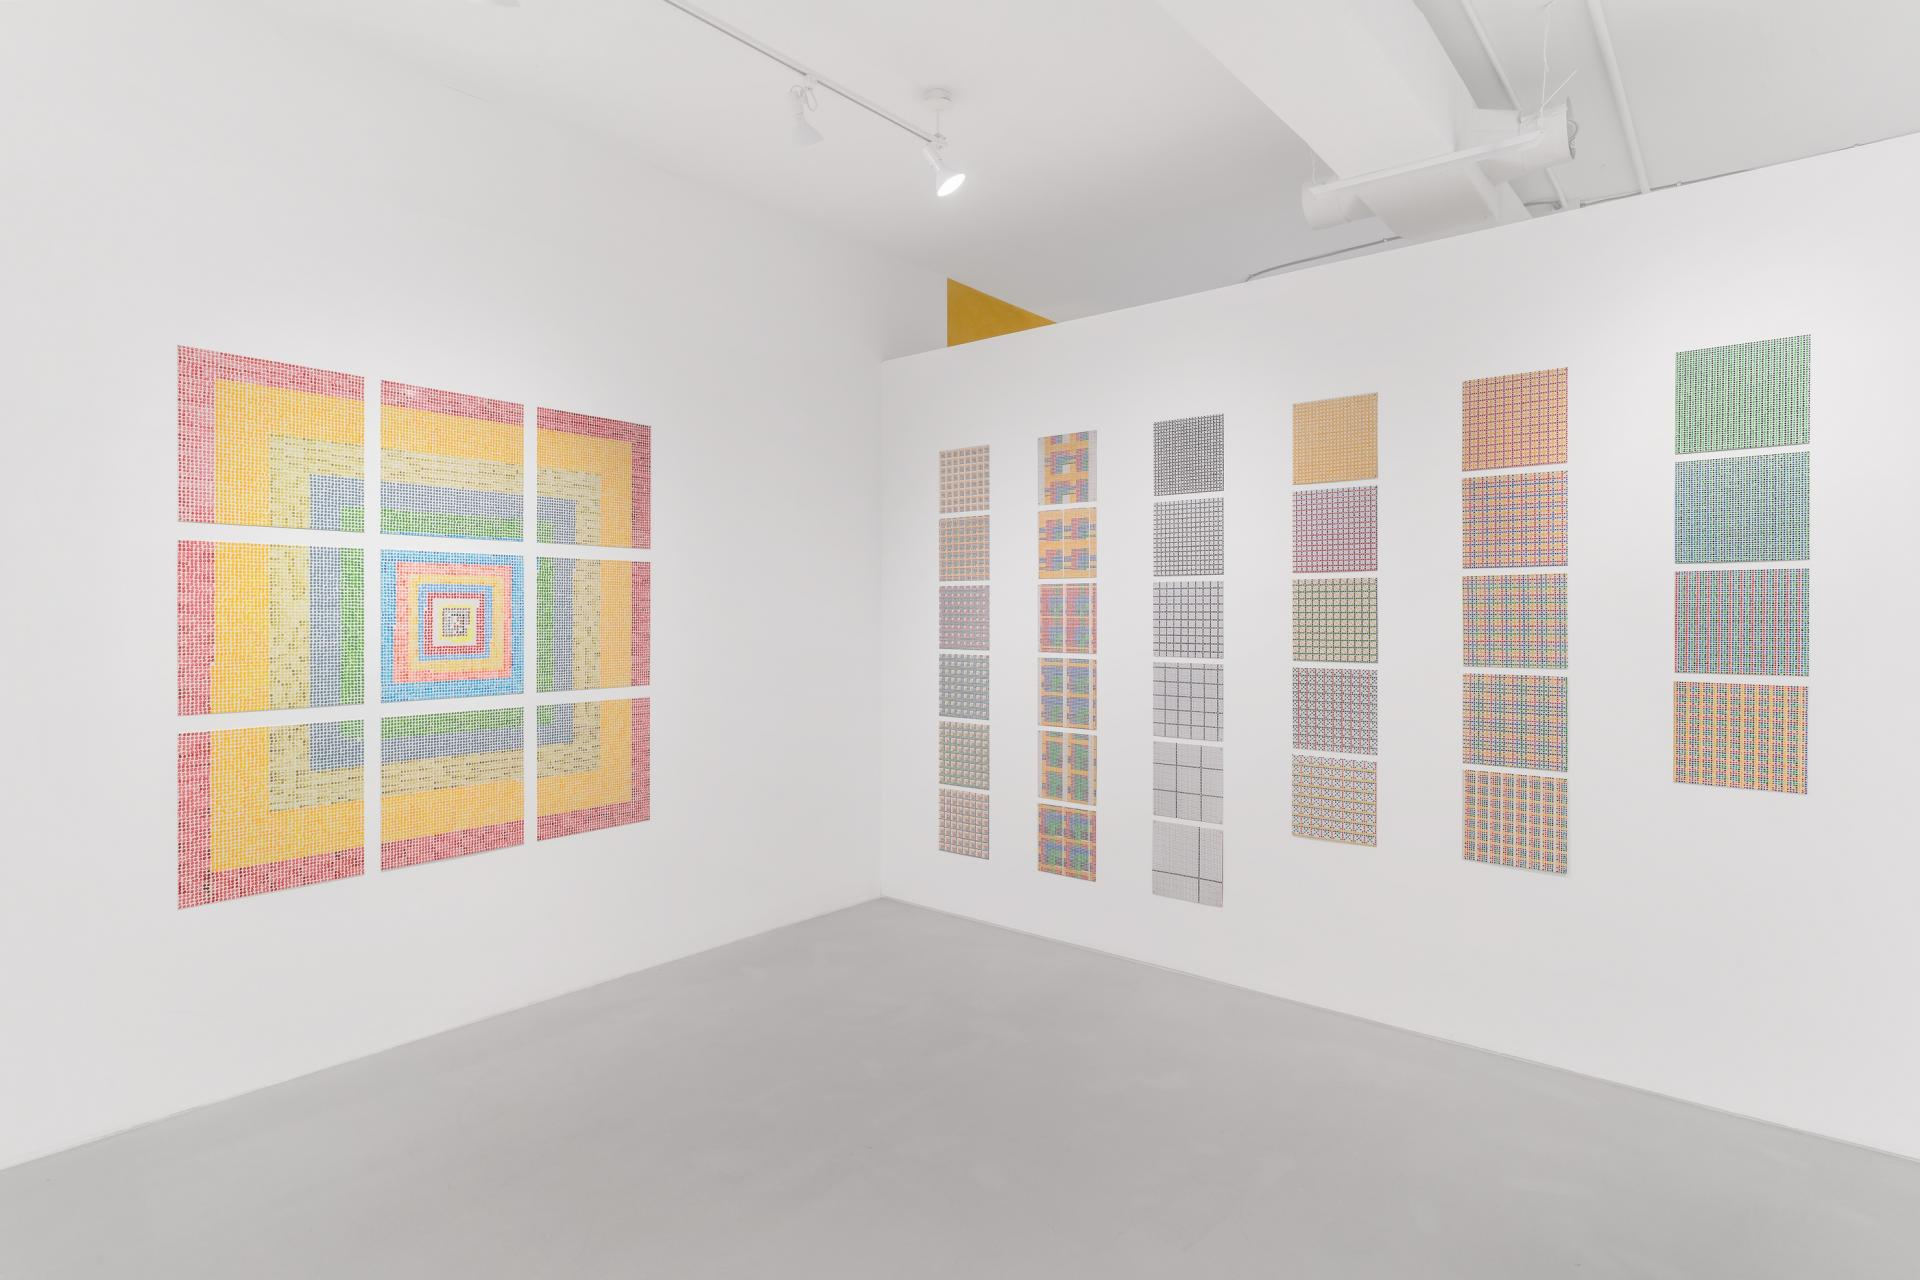 Installation view, Jennifer Bartlett: Grids & Dots, Paula Cooper Gallery, 243A Worth Avenue, Palm Beach, FL, January 16 – February 7, 2021. Photo: Michael Lopez with Zachary Balber.